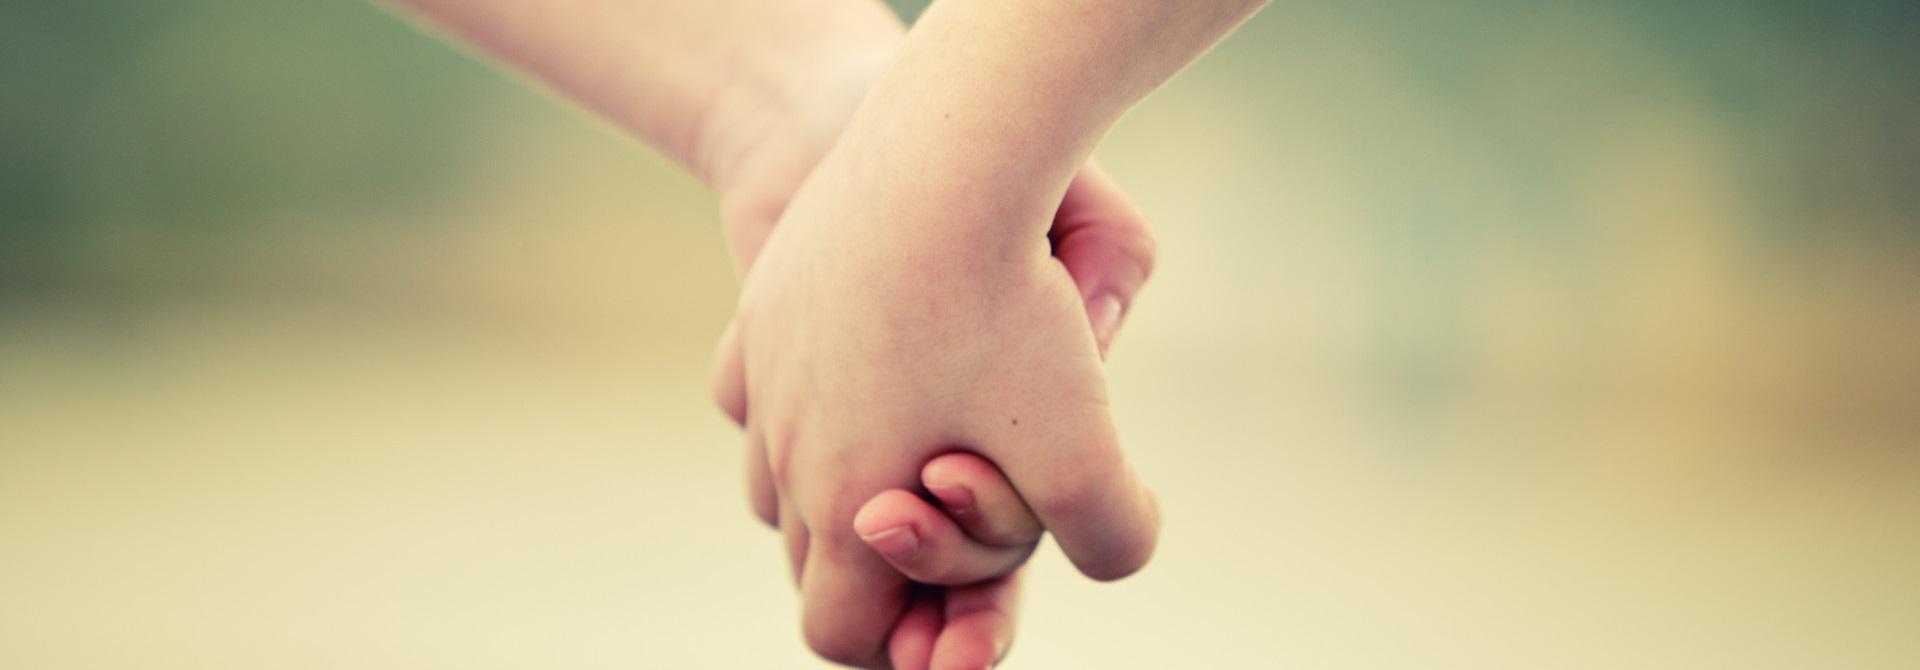 хванати-ръце